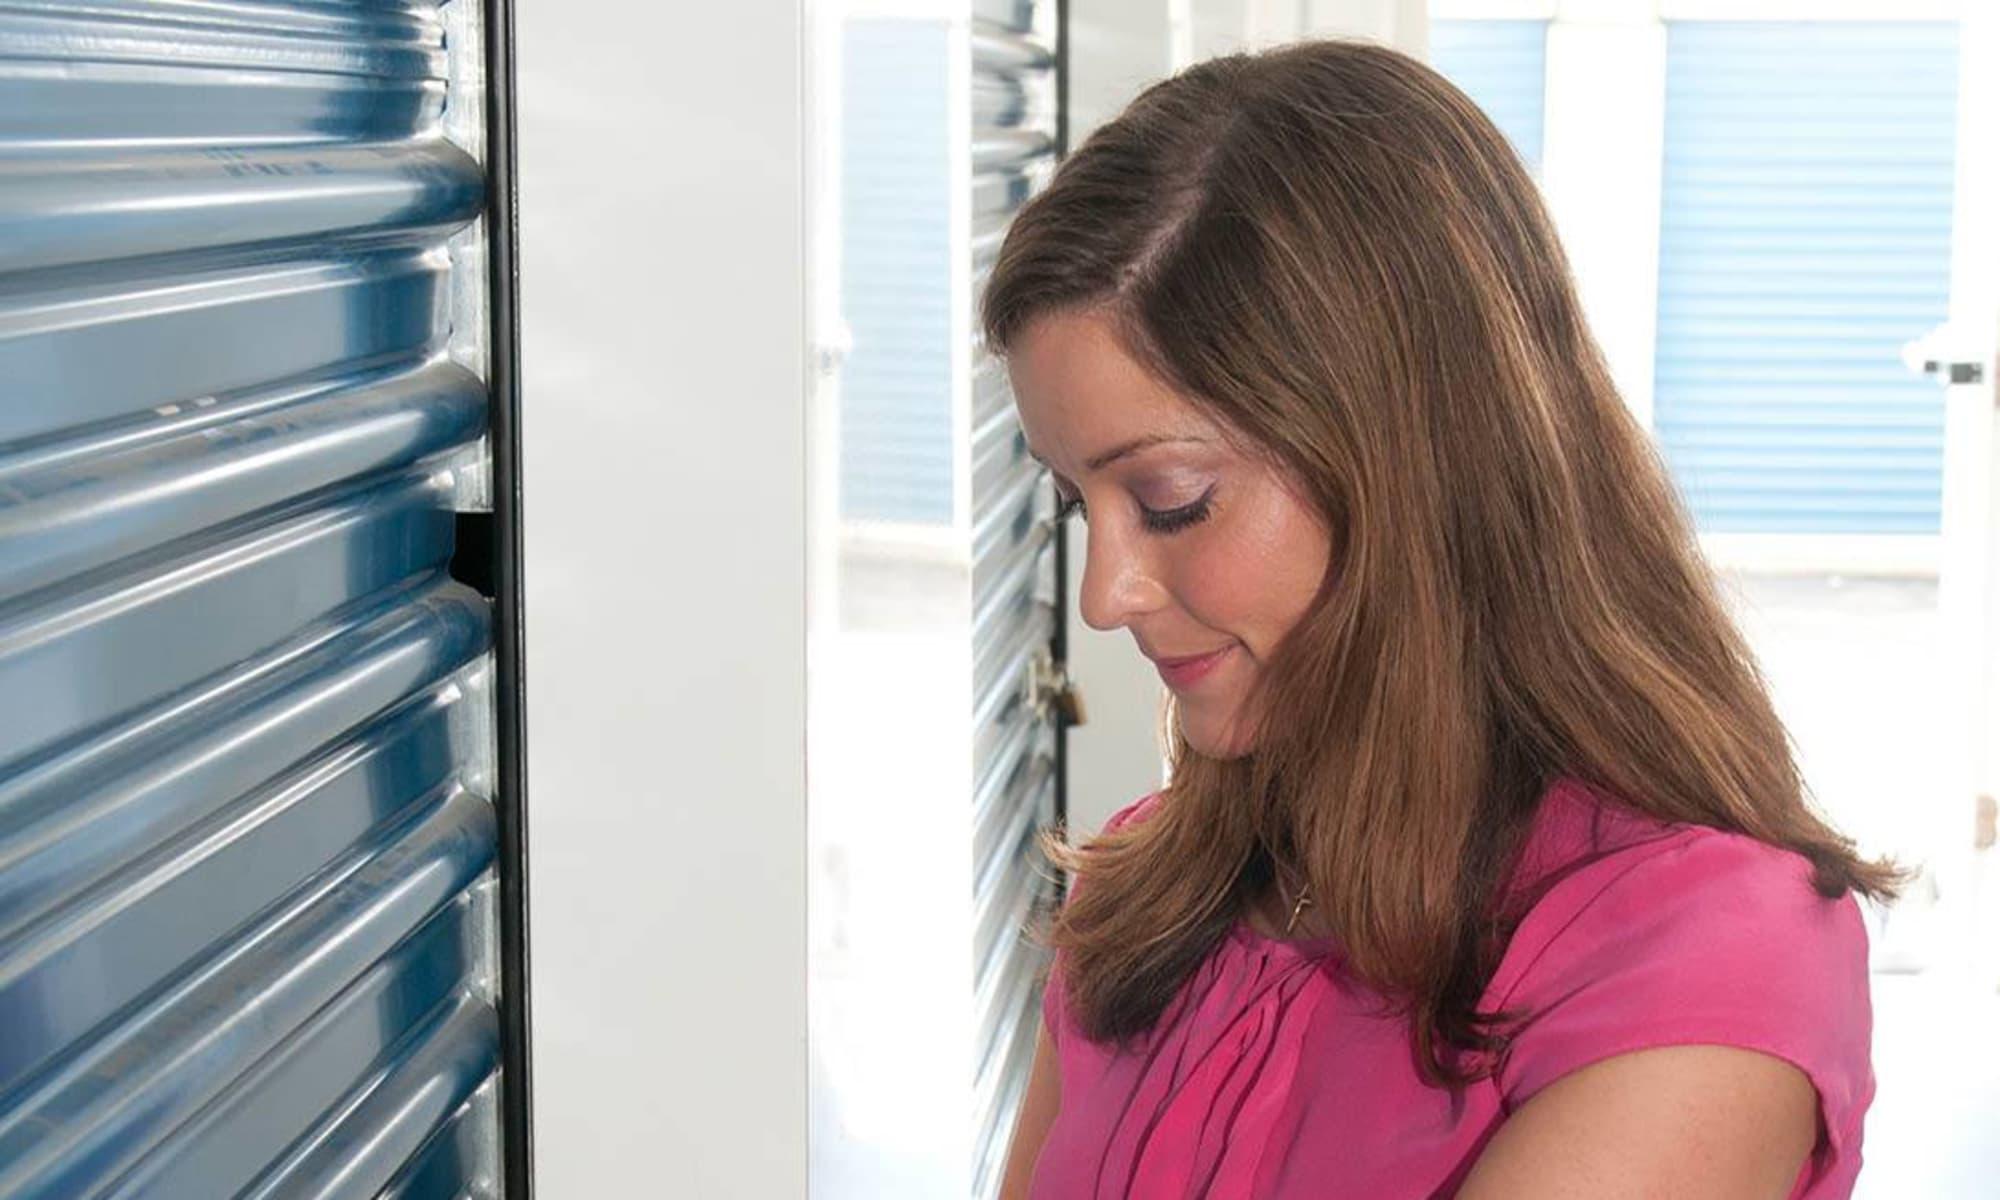 A customer unlocking her storage unit at Virginia Varsity Storage in Roanoke, Virginia